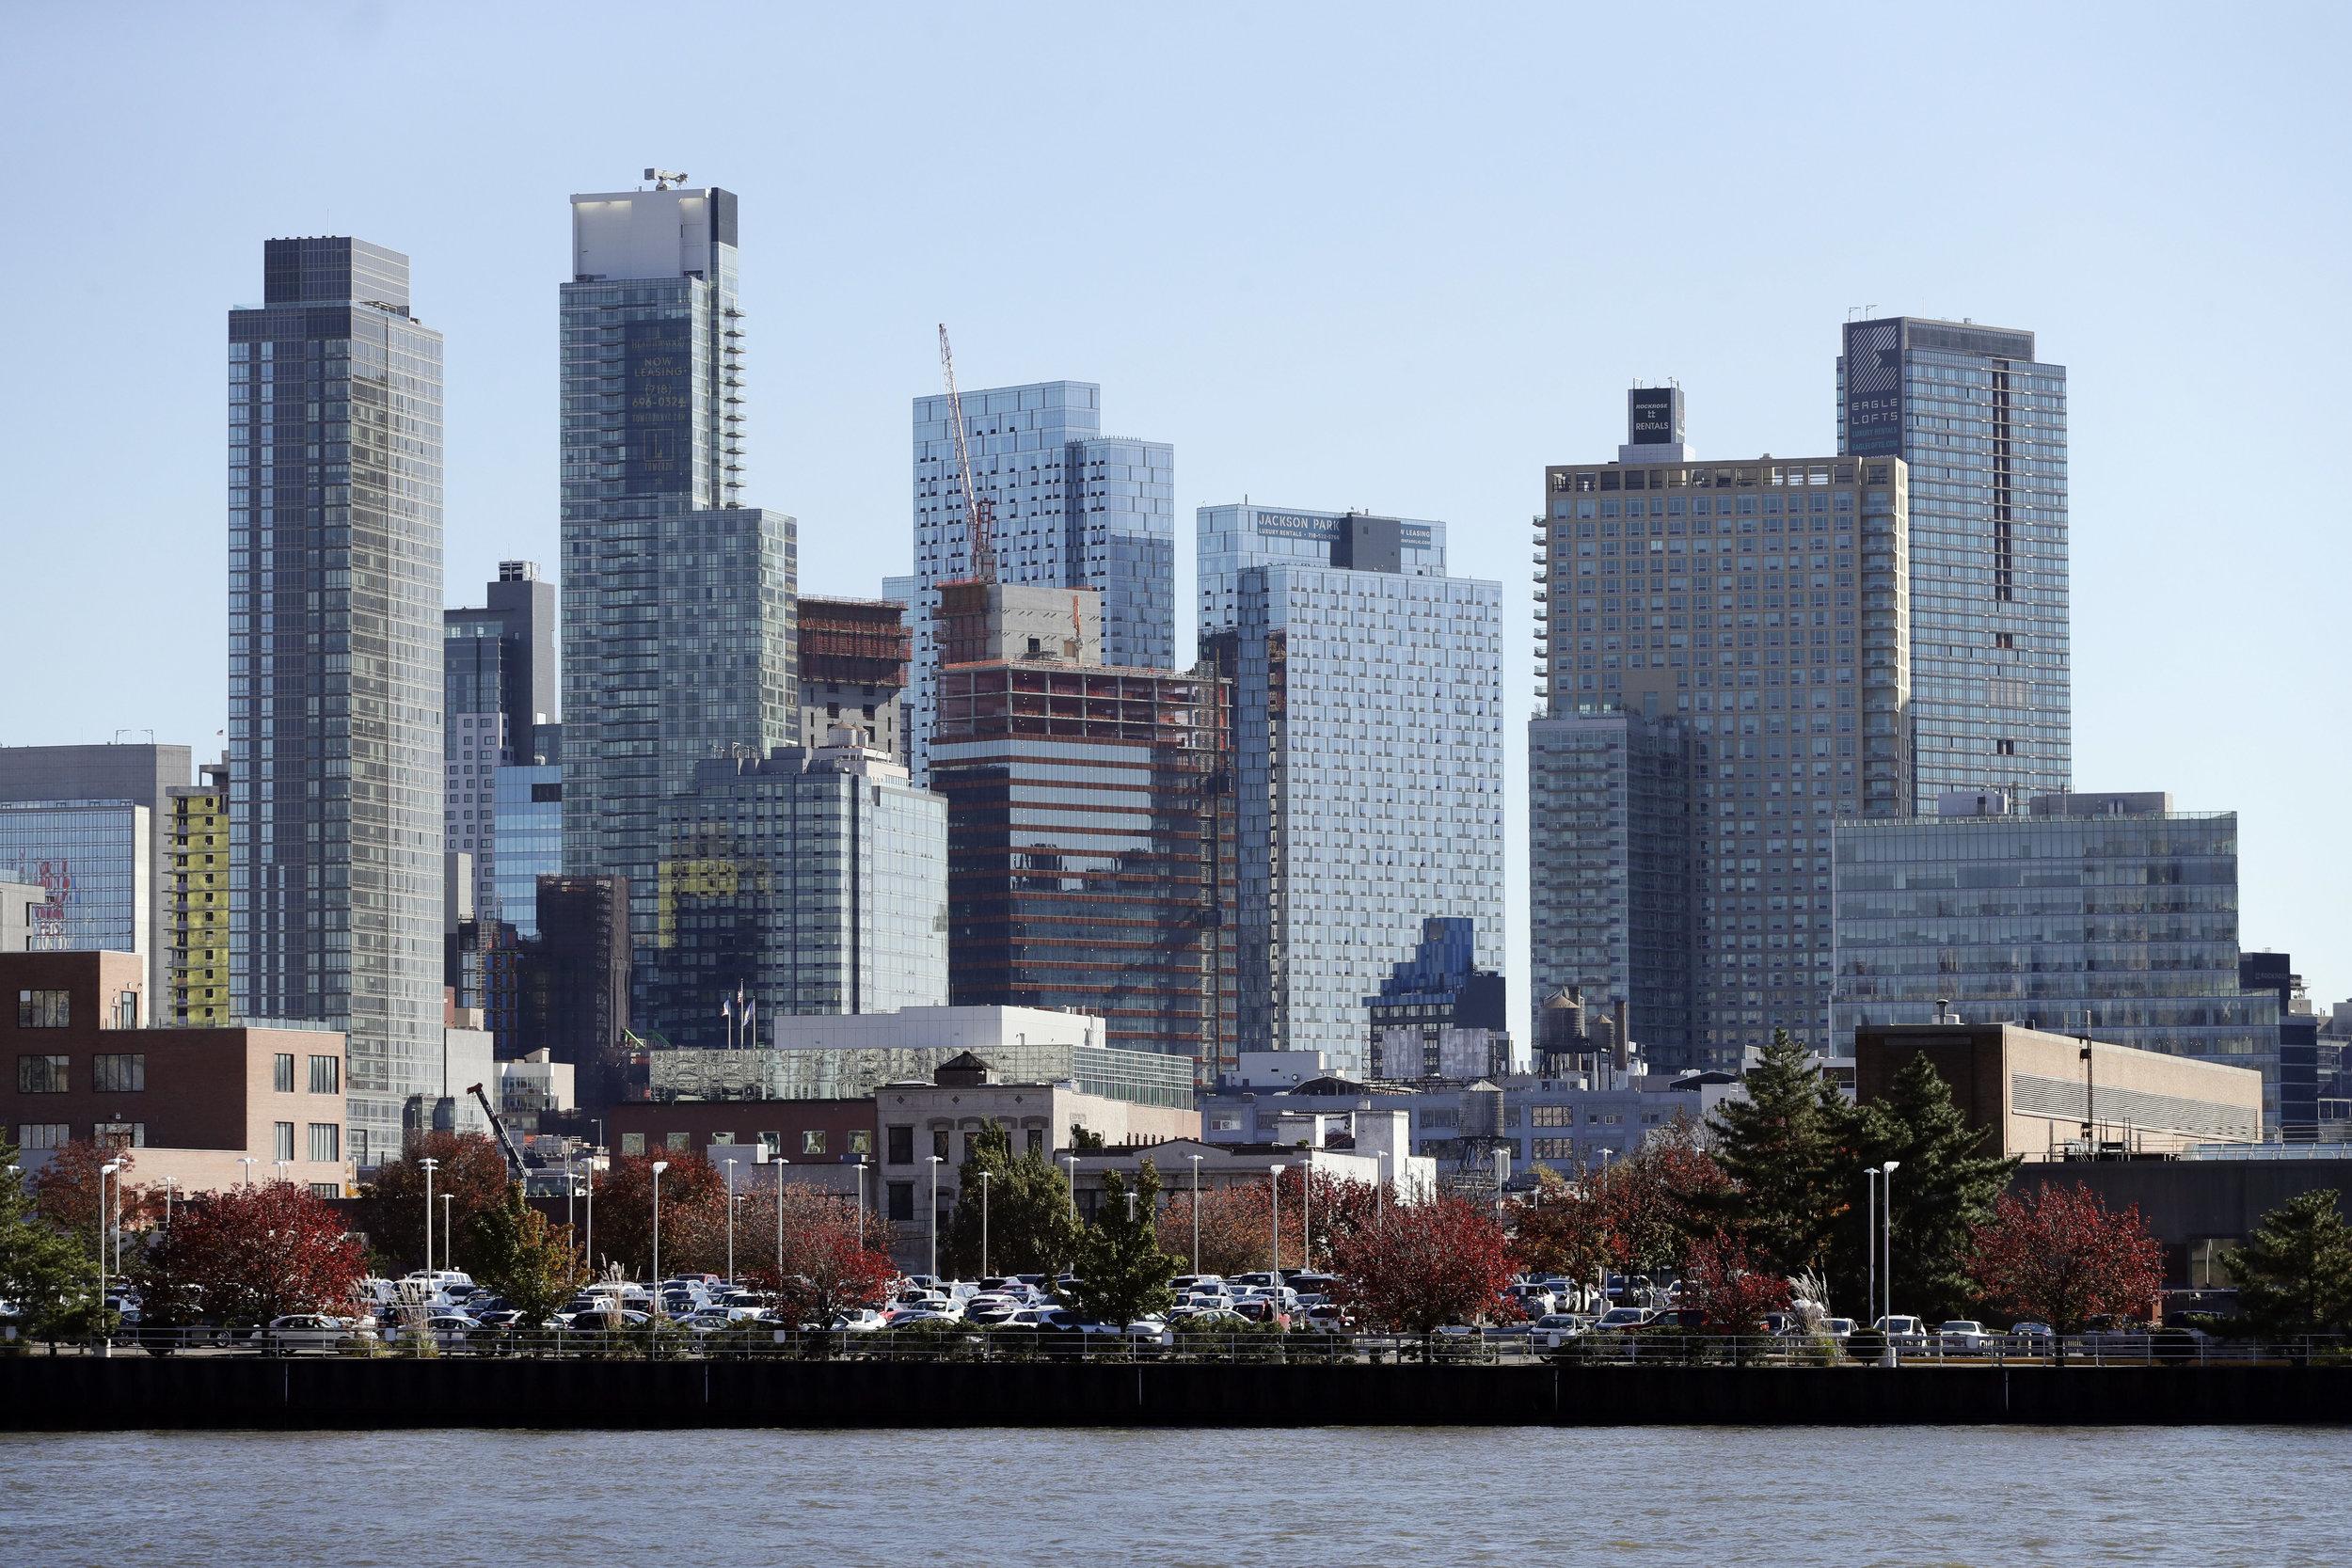 The Long Island City skyline. Photo via AP.